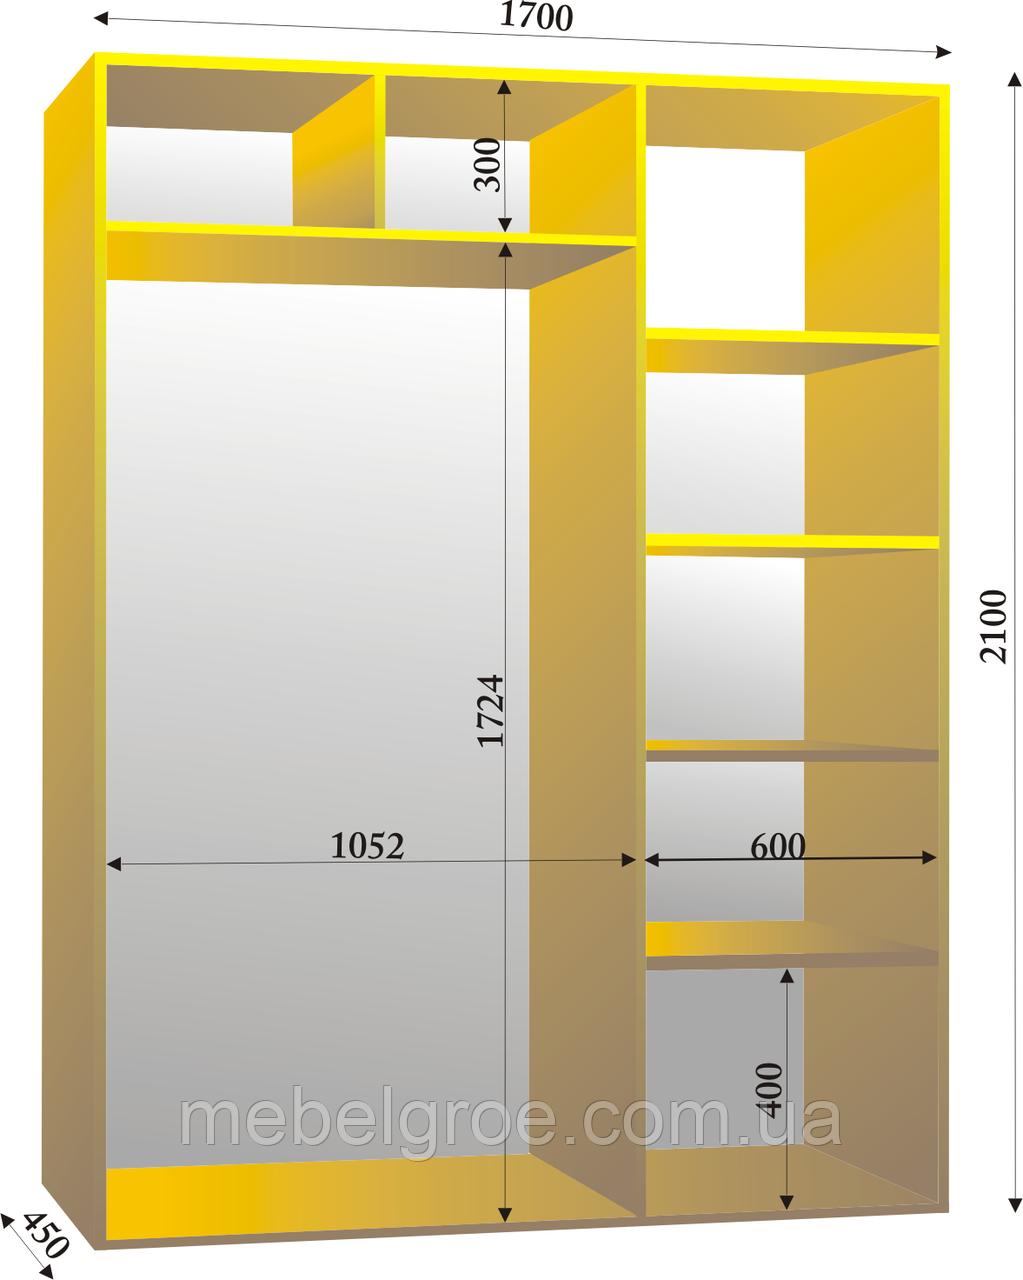 Шкаф-купе двухдверный 1700х450х2100 тм Эксклюзив